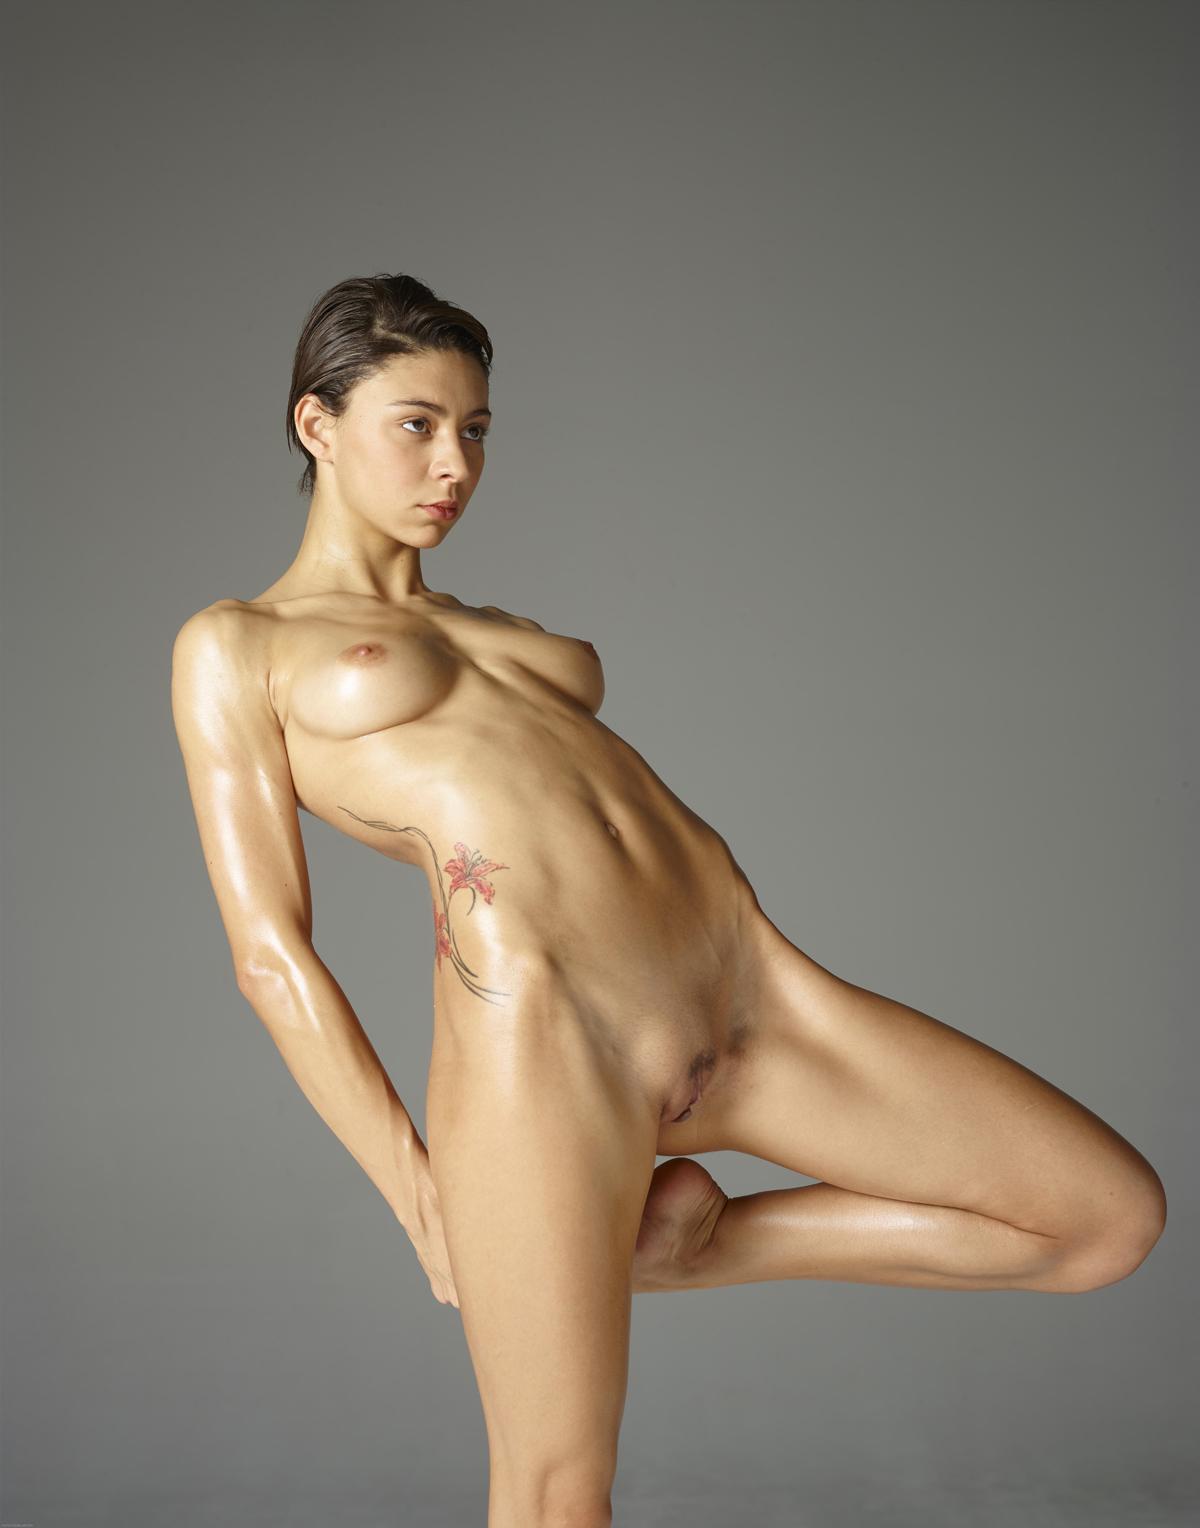 Erotic Beauty Photos And Pics